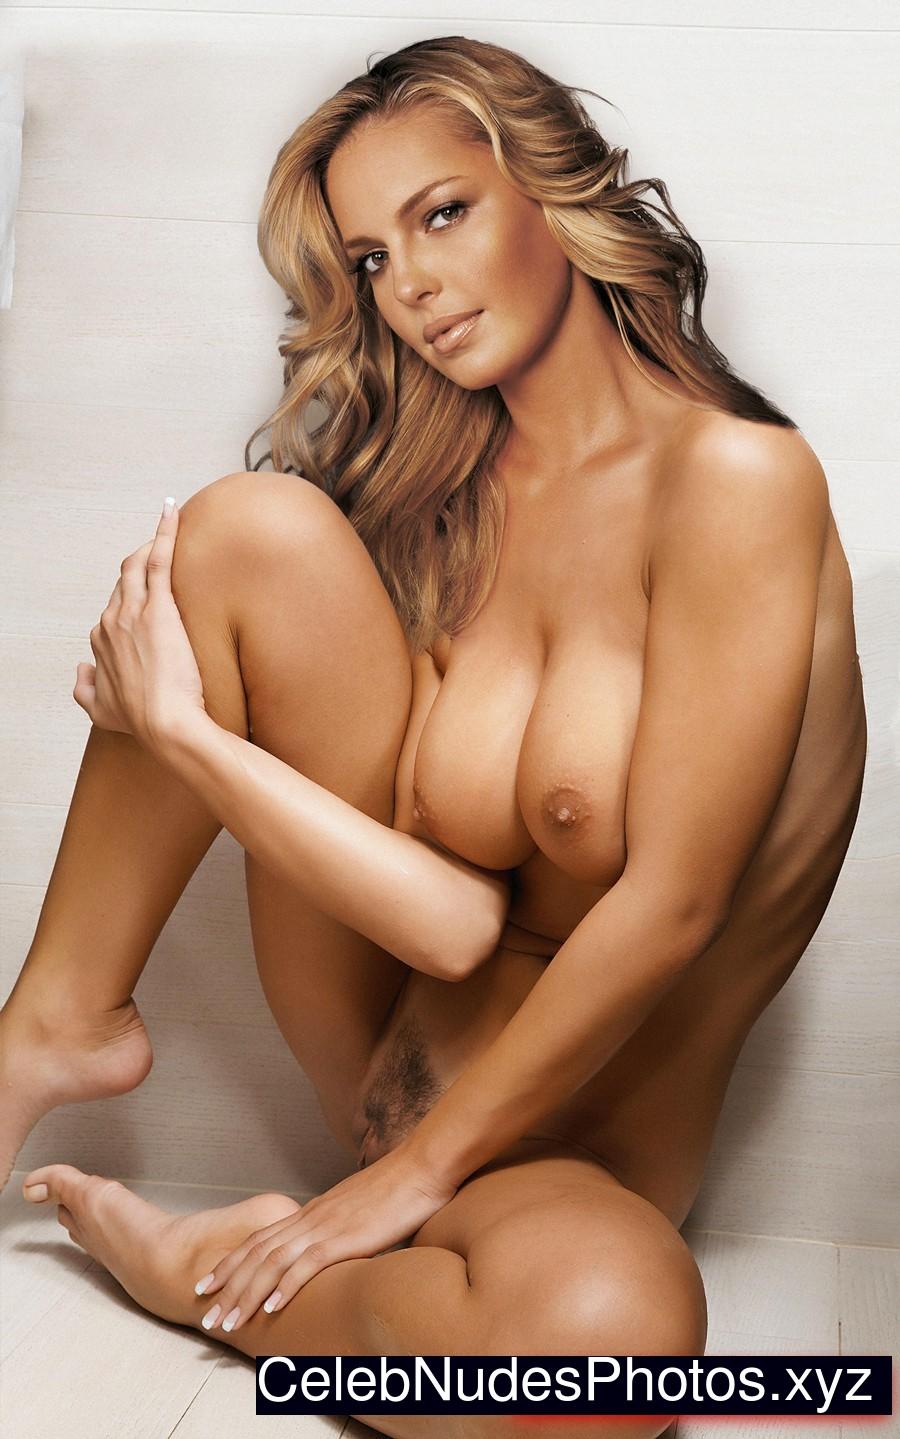 angelina jolie naked breasts